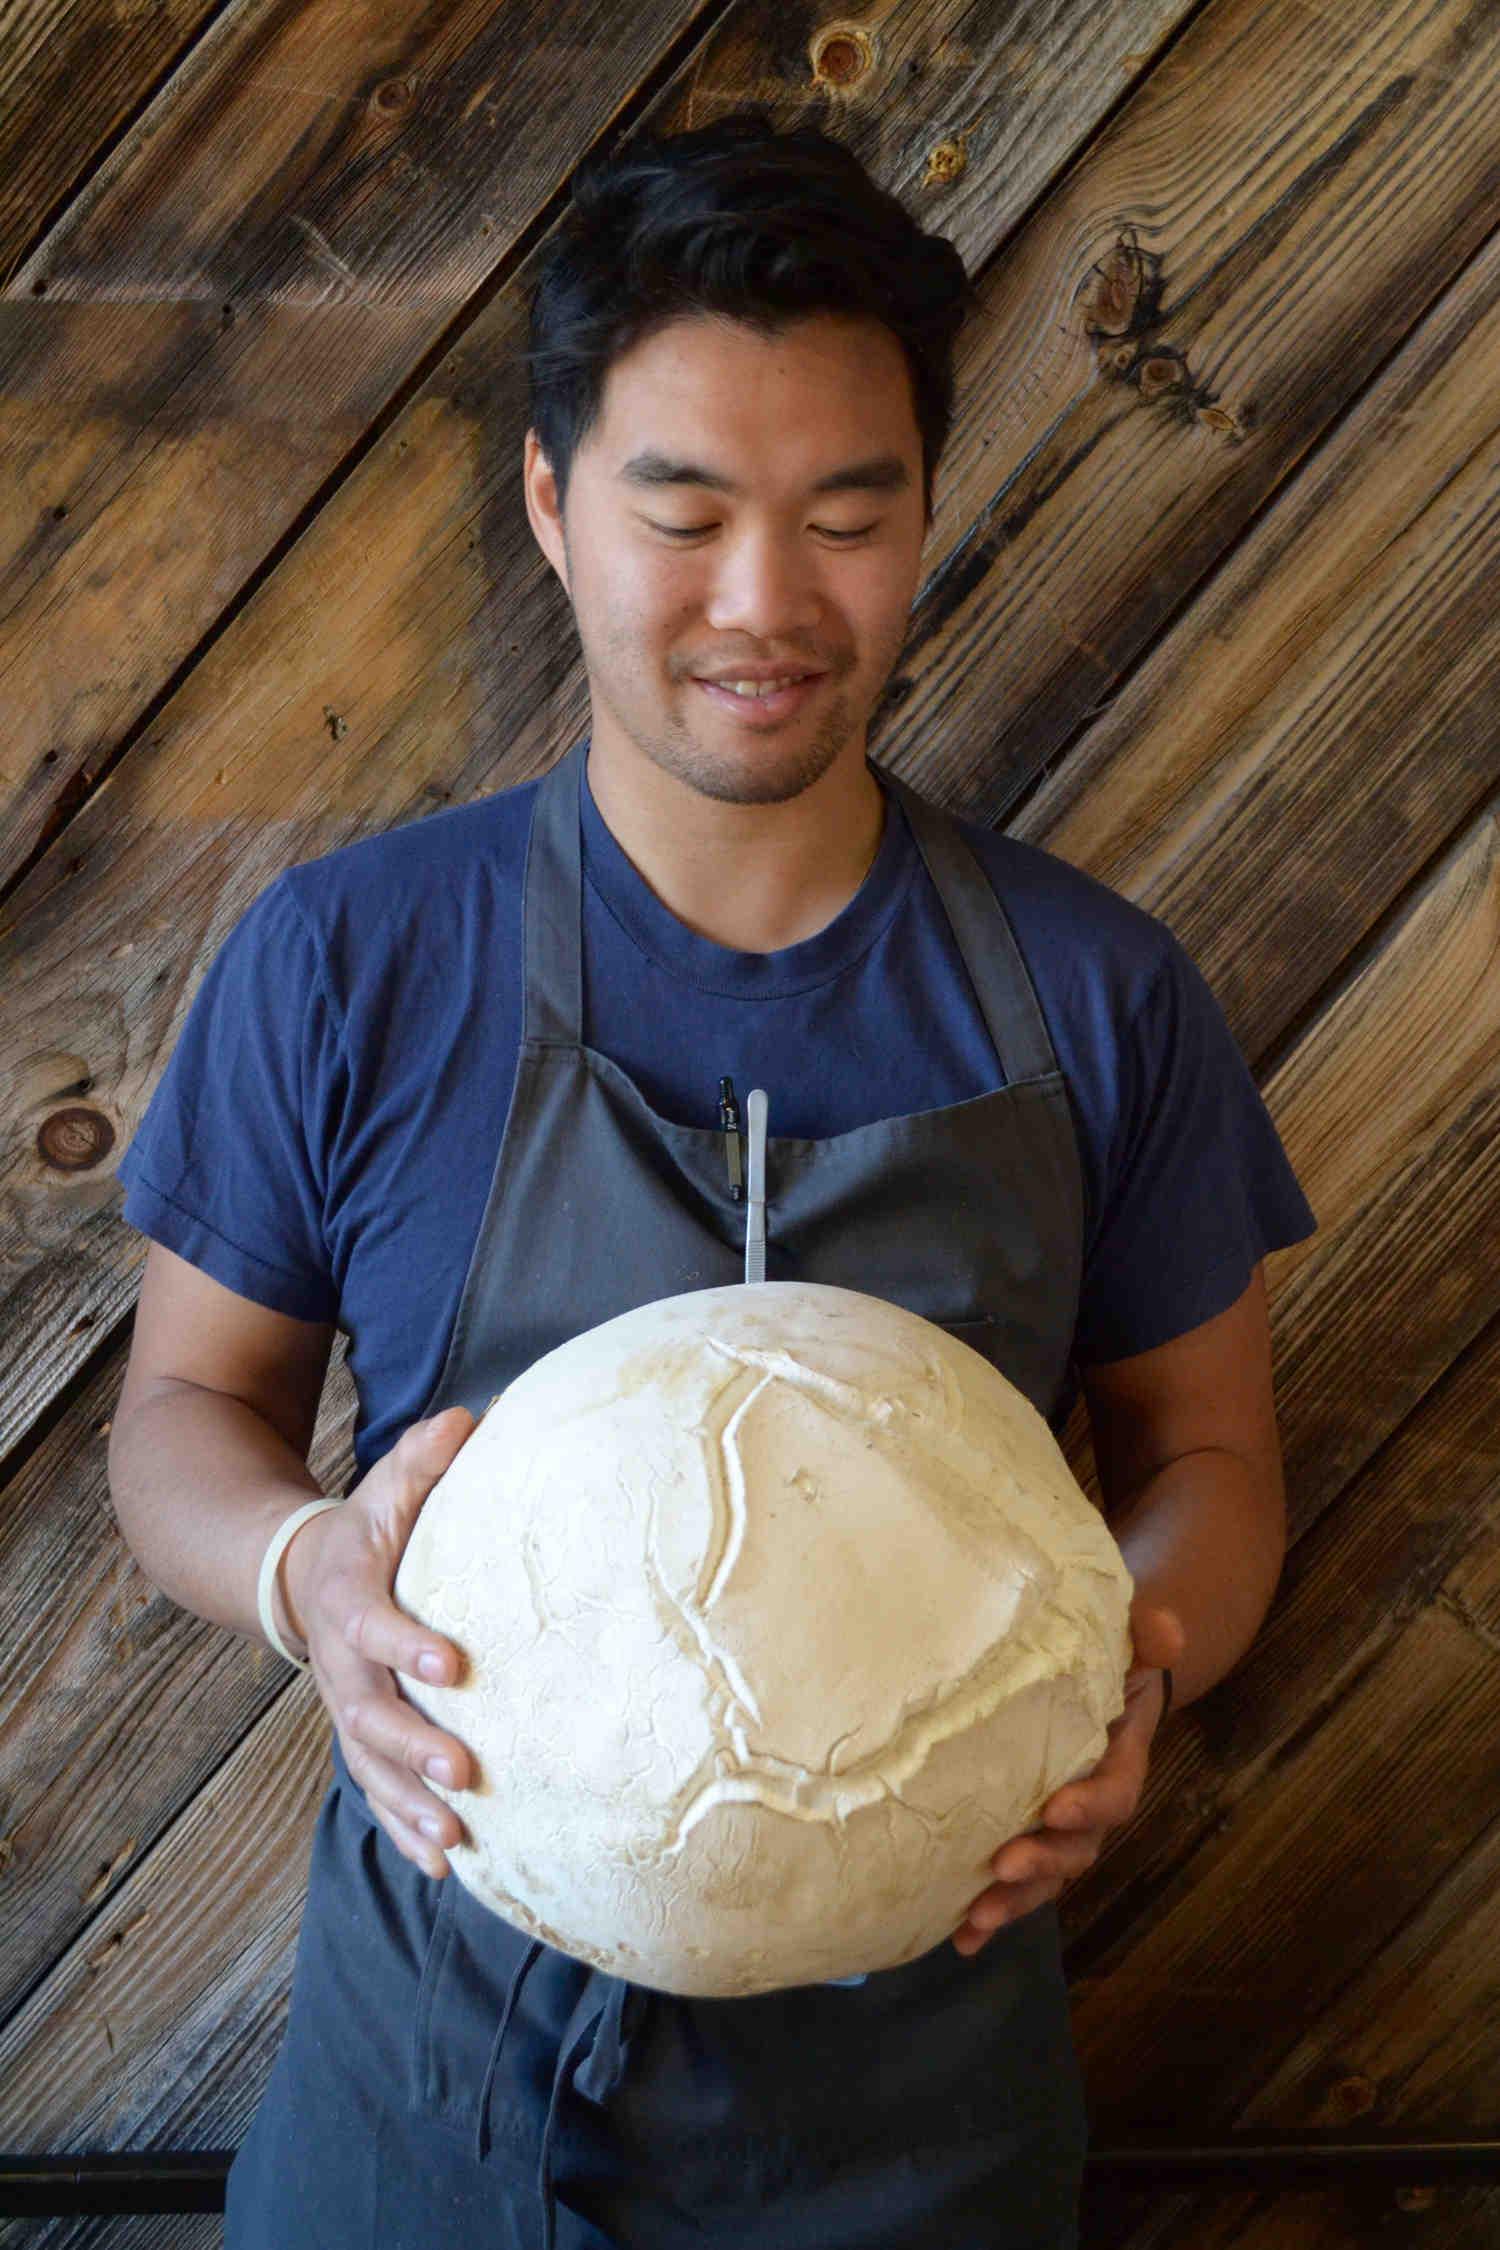 Chef Tru w/ giant puff ball (Executive Chef Journeyman)